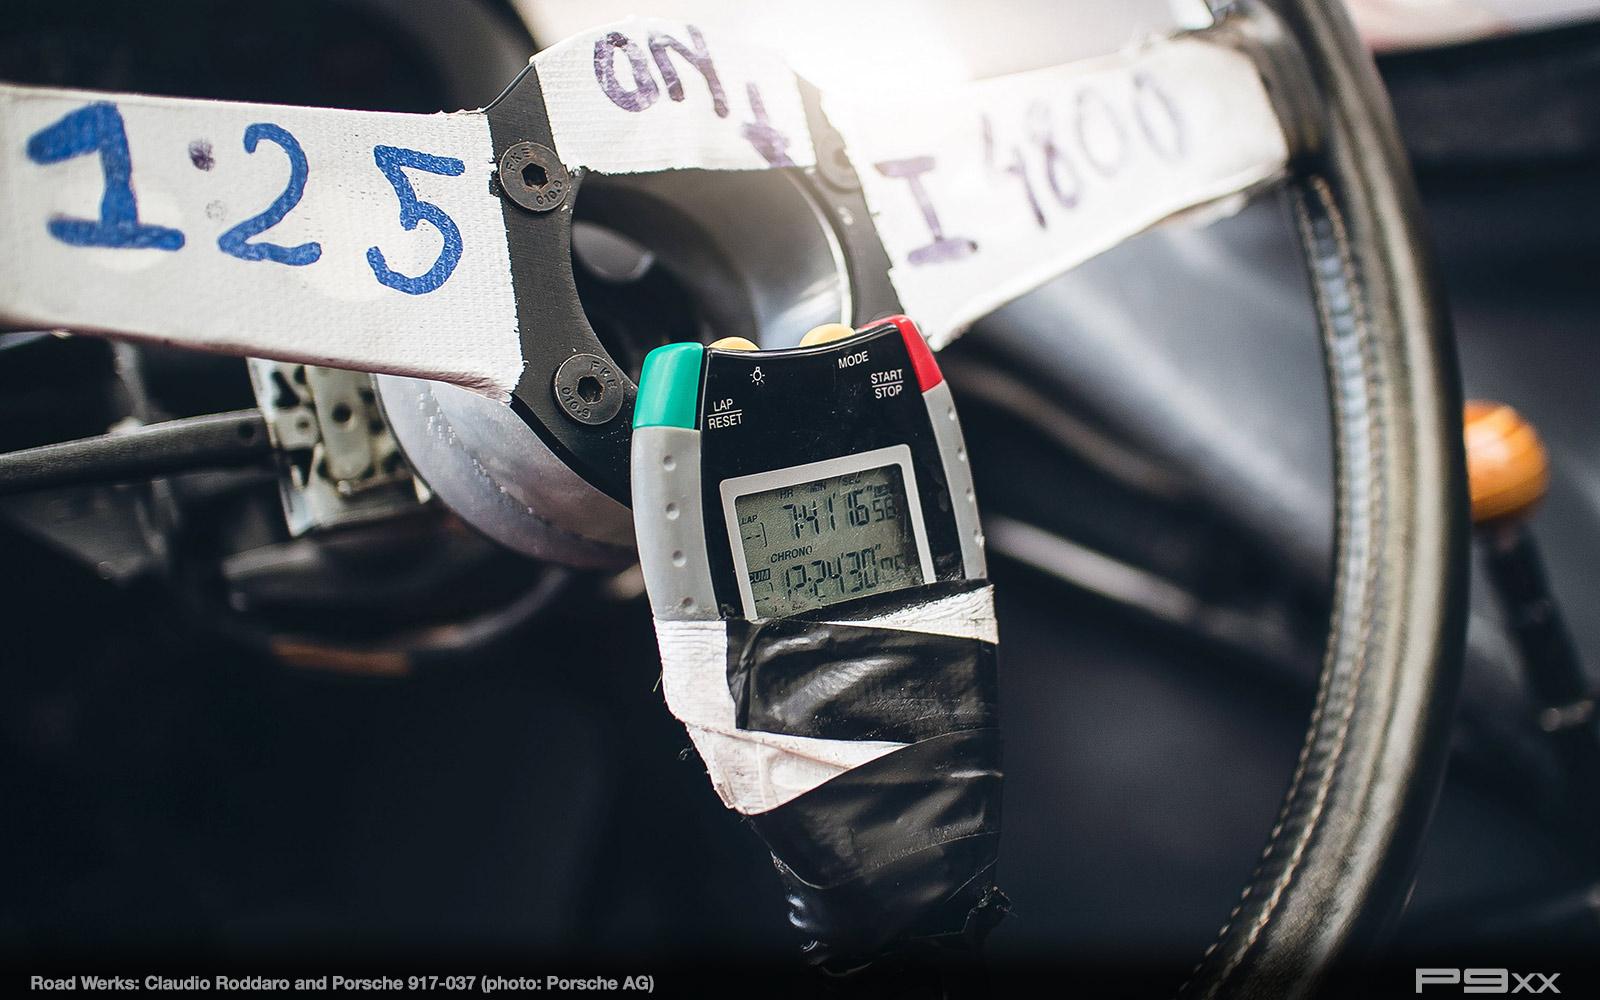 Porsche-917-037-Martini-Racing-Monaco-2018-295